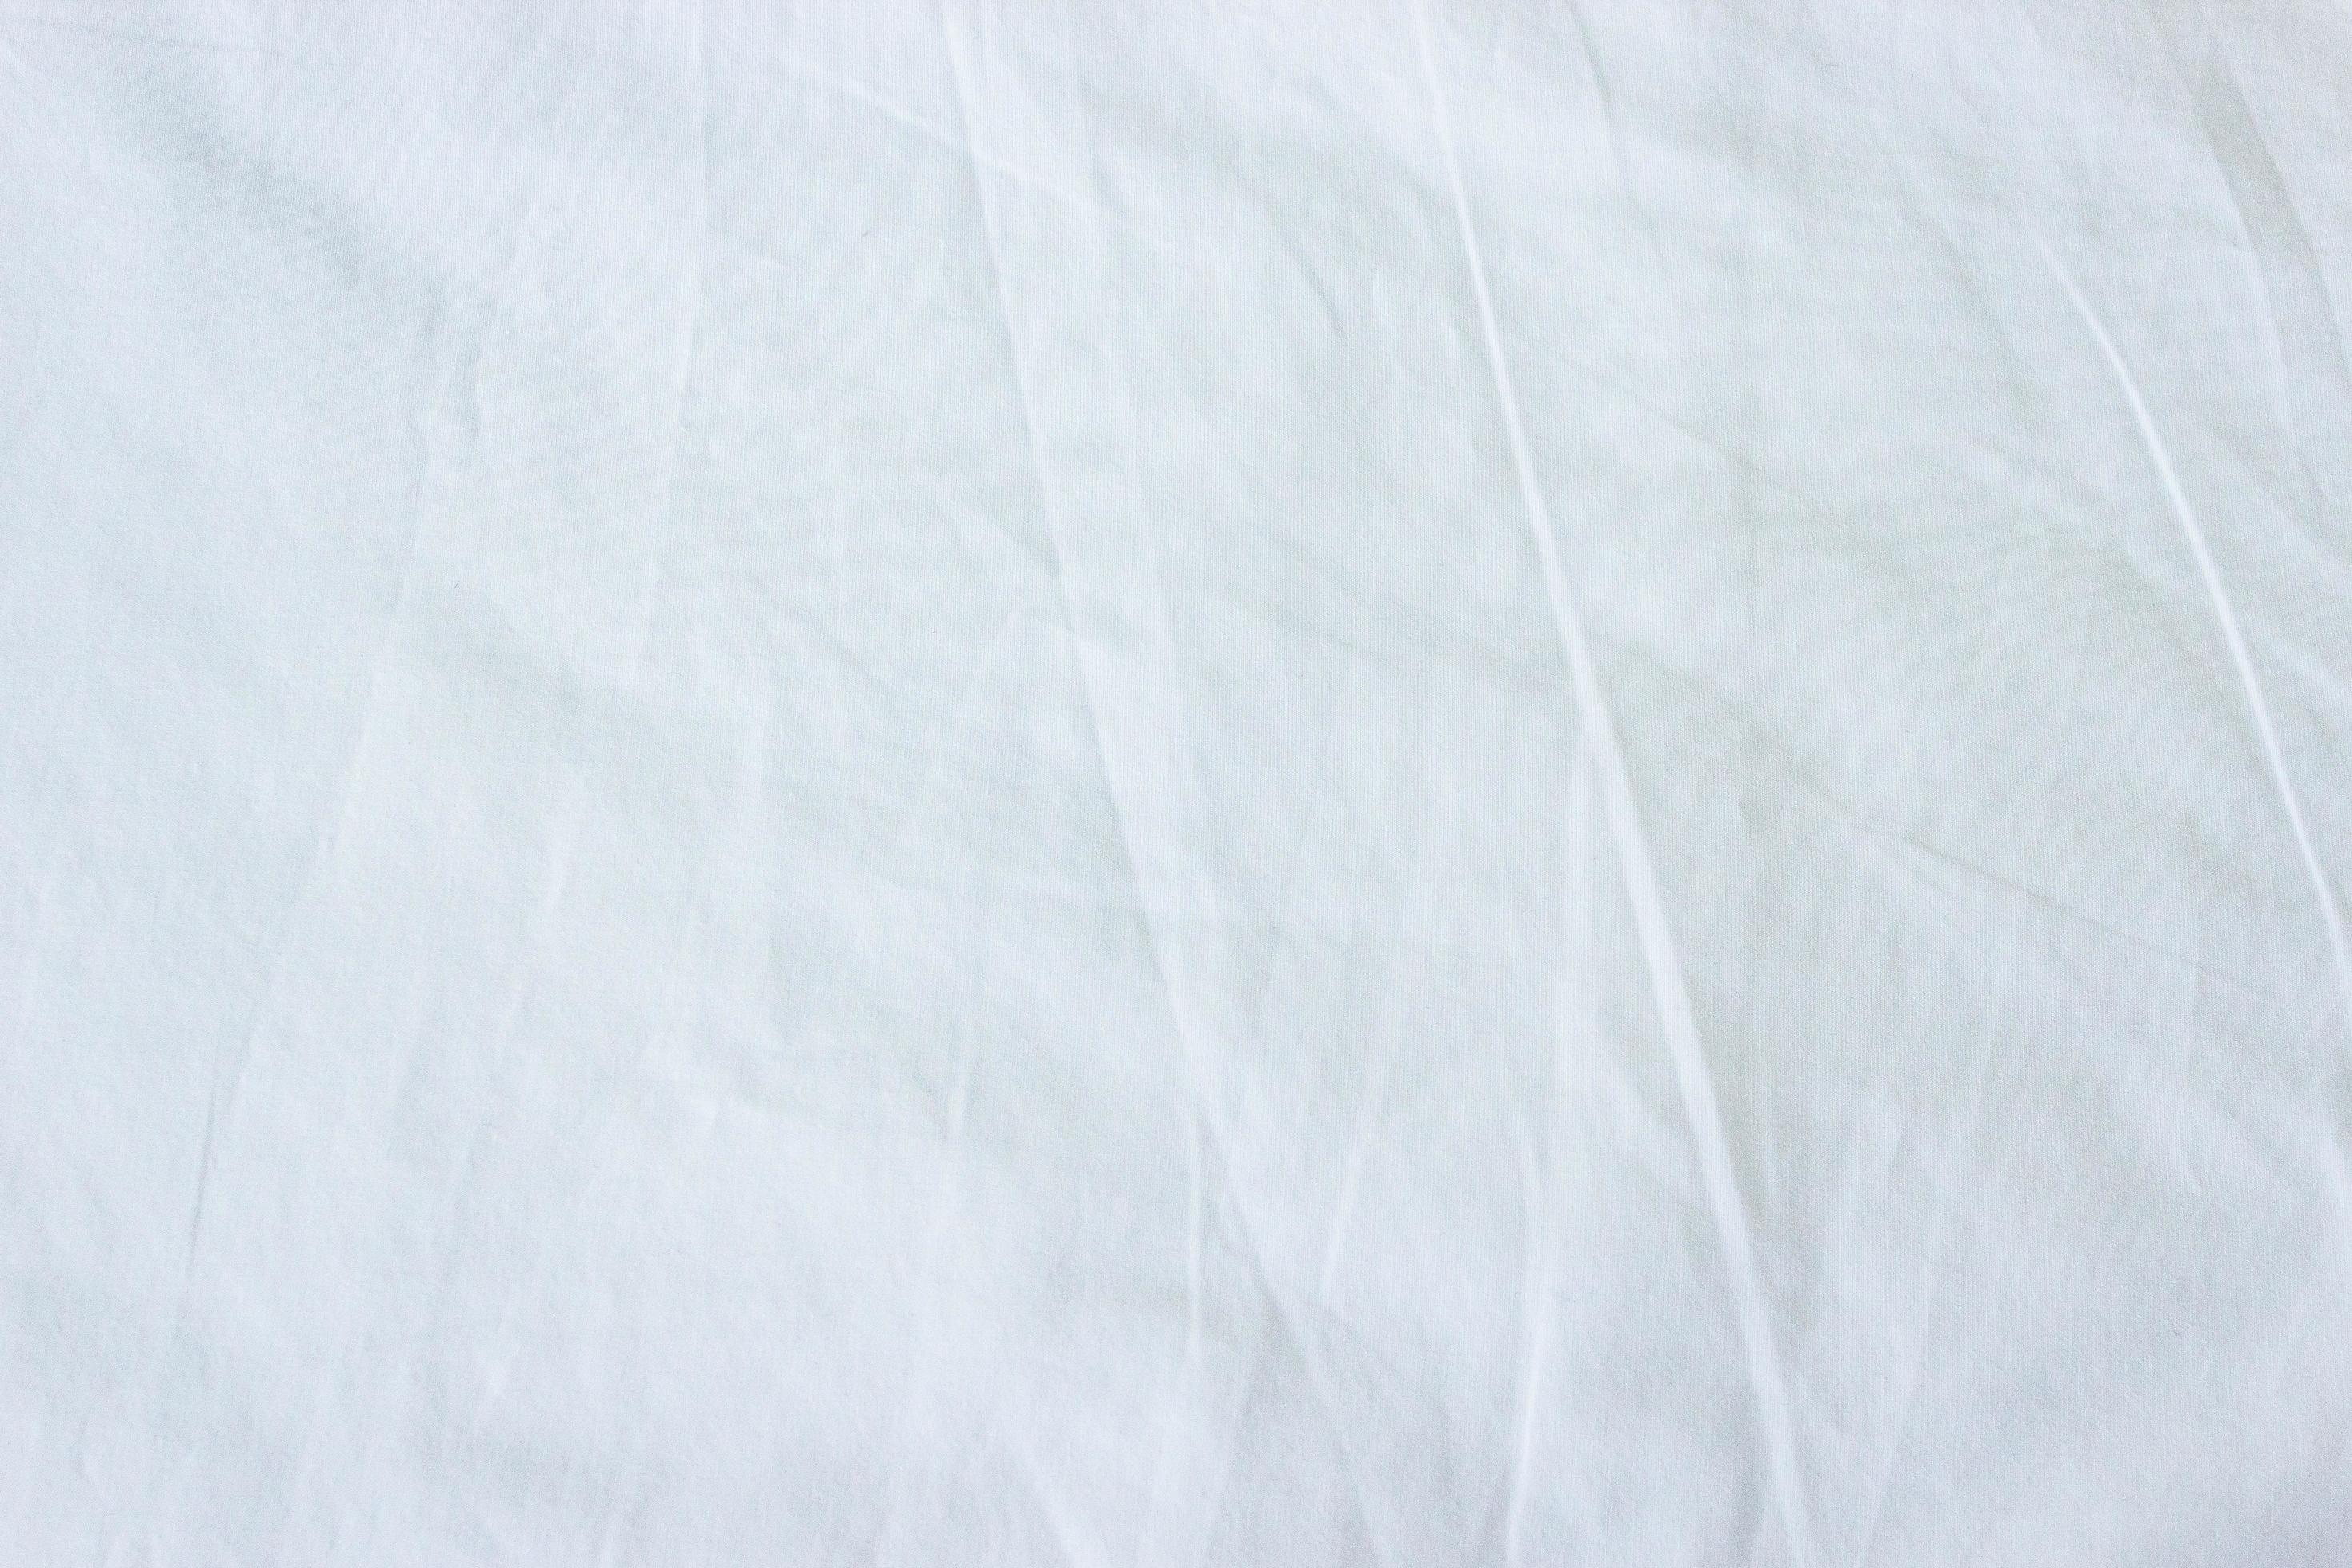 white fabric bed sheet stock photo